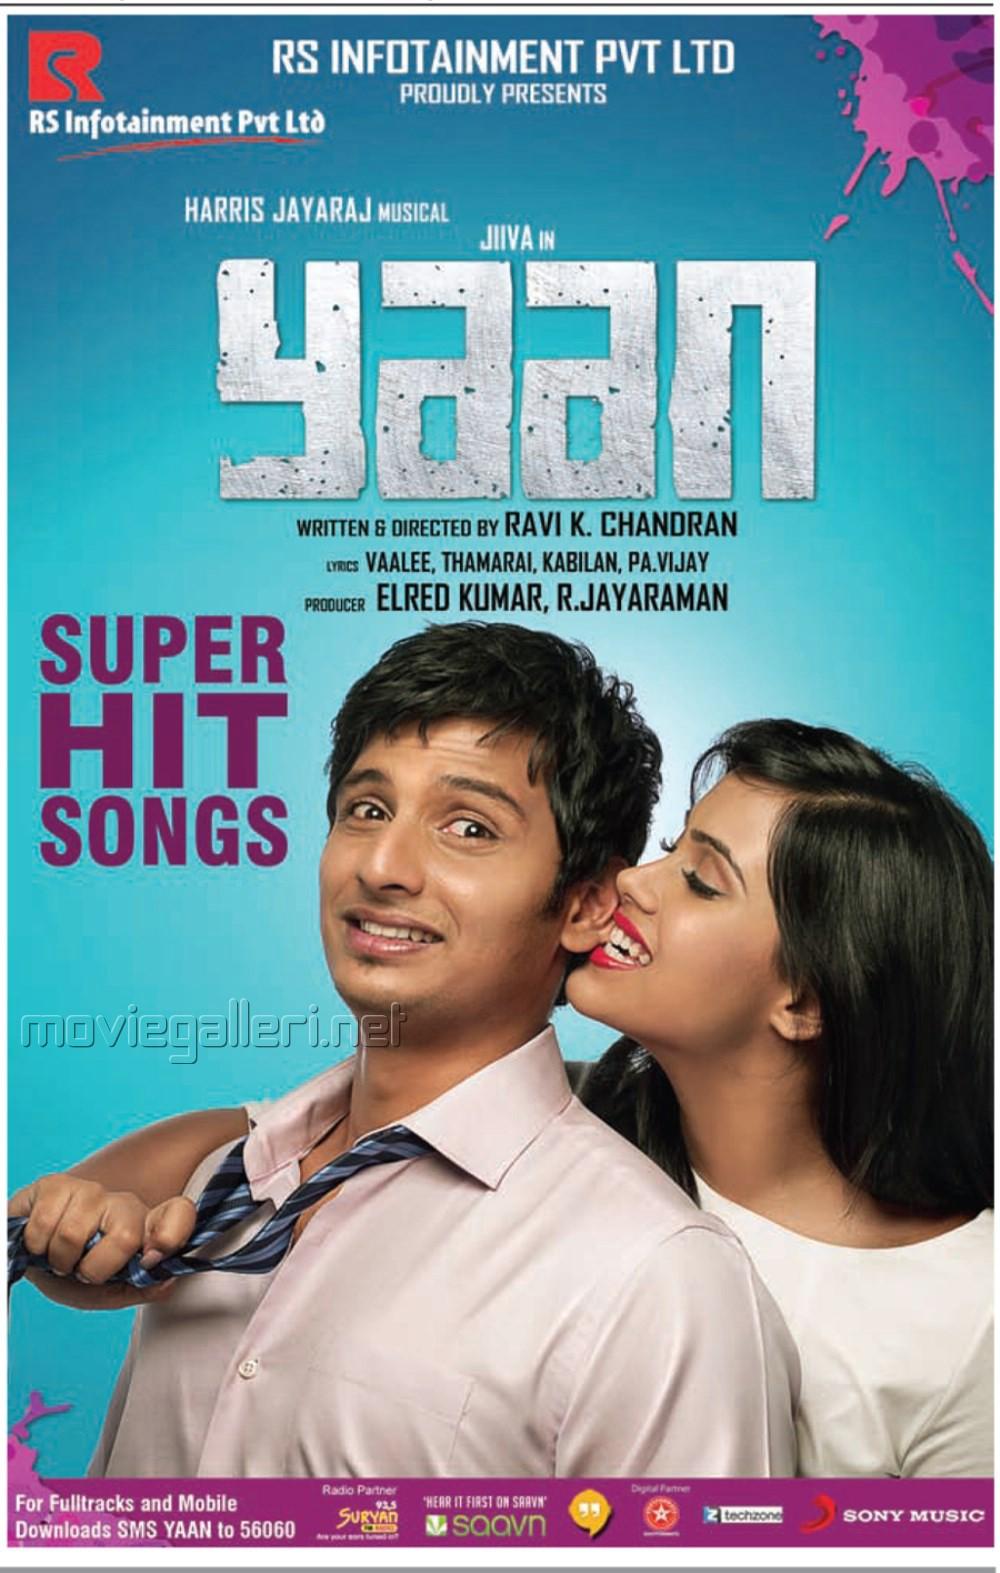 Jeeva Tamil Movie Songs Free Download 2014 - LTT